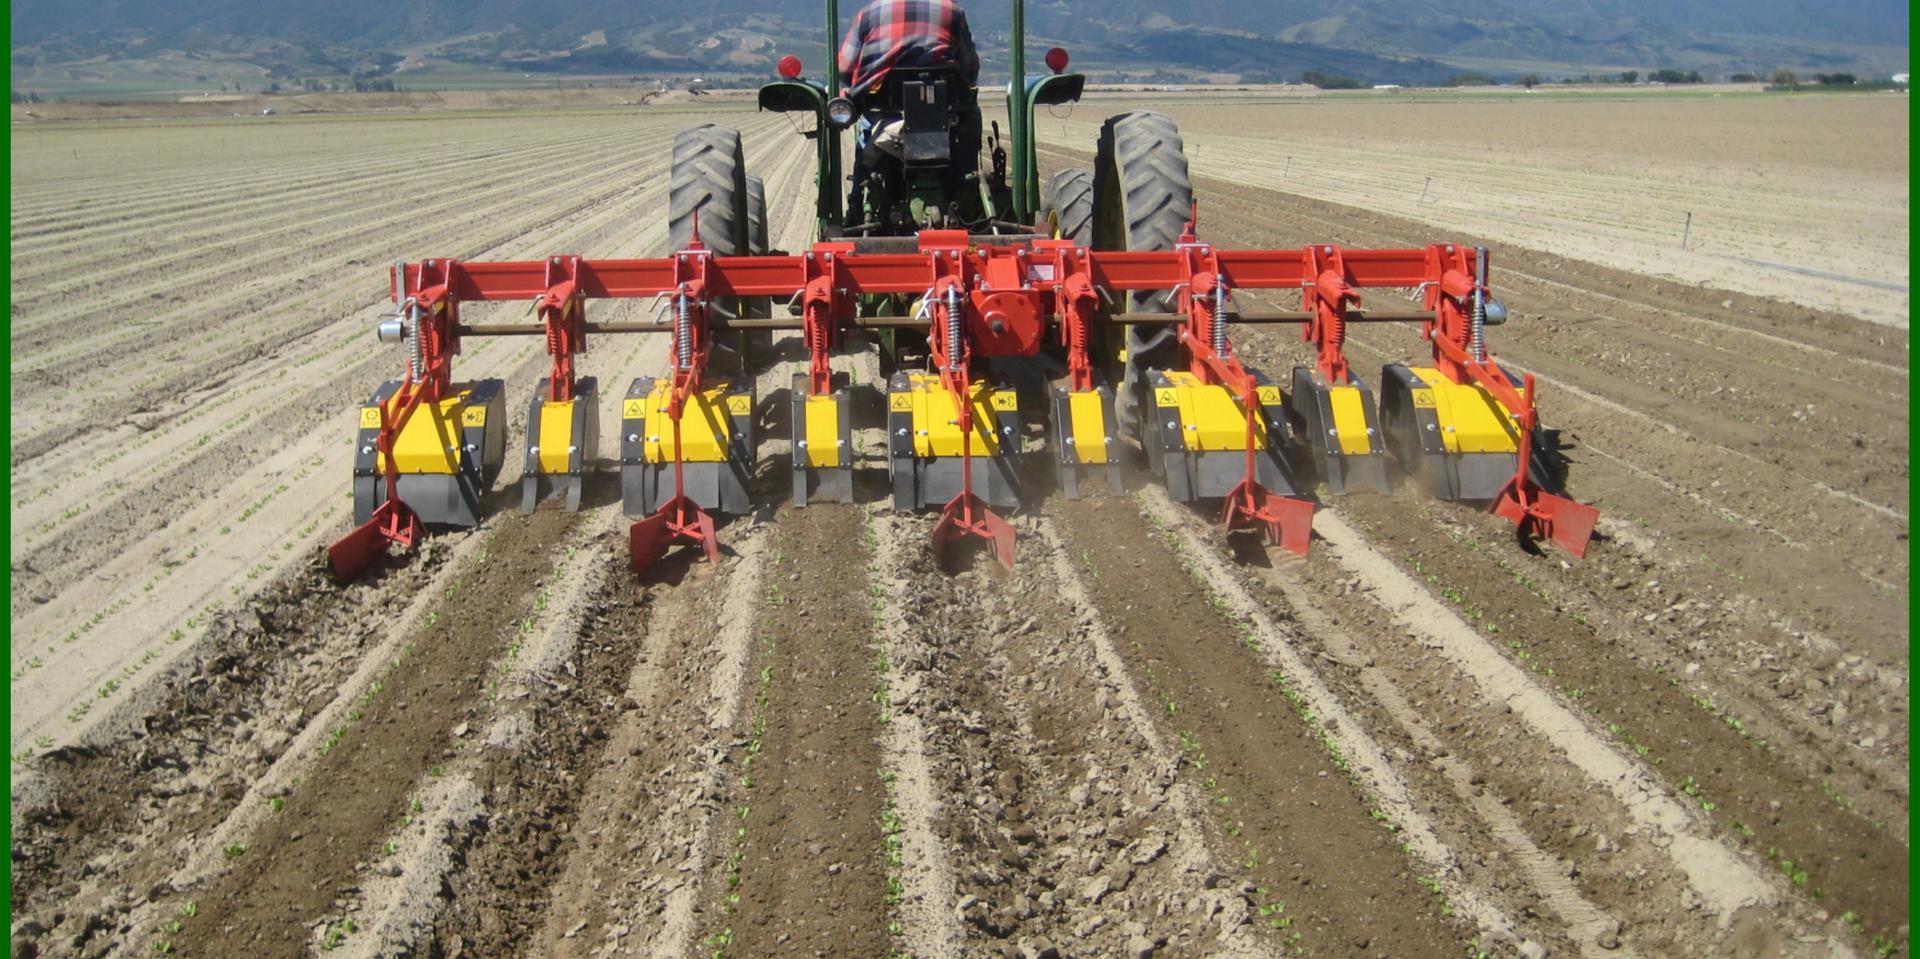 Multirototiller Weed Control Agricultural